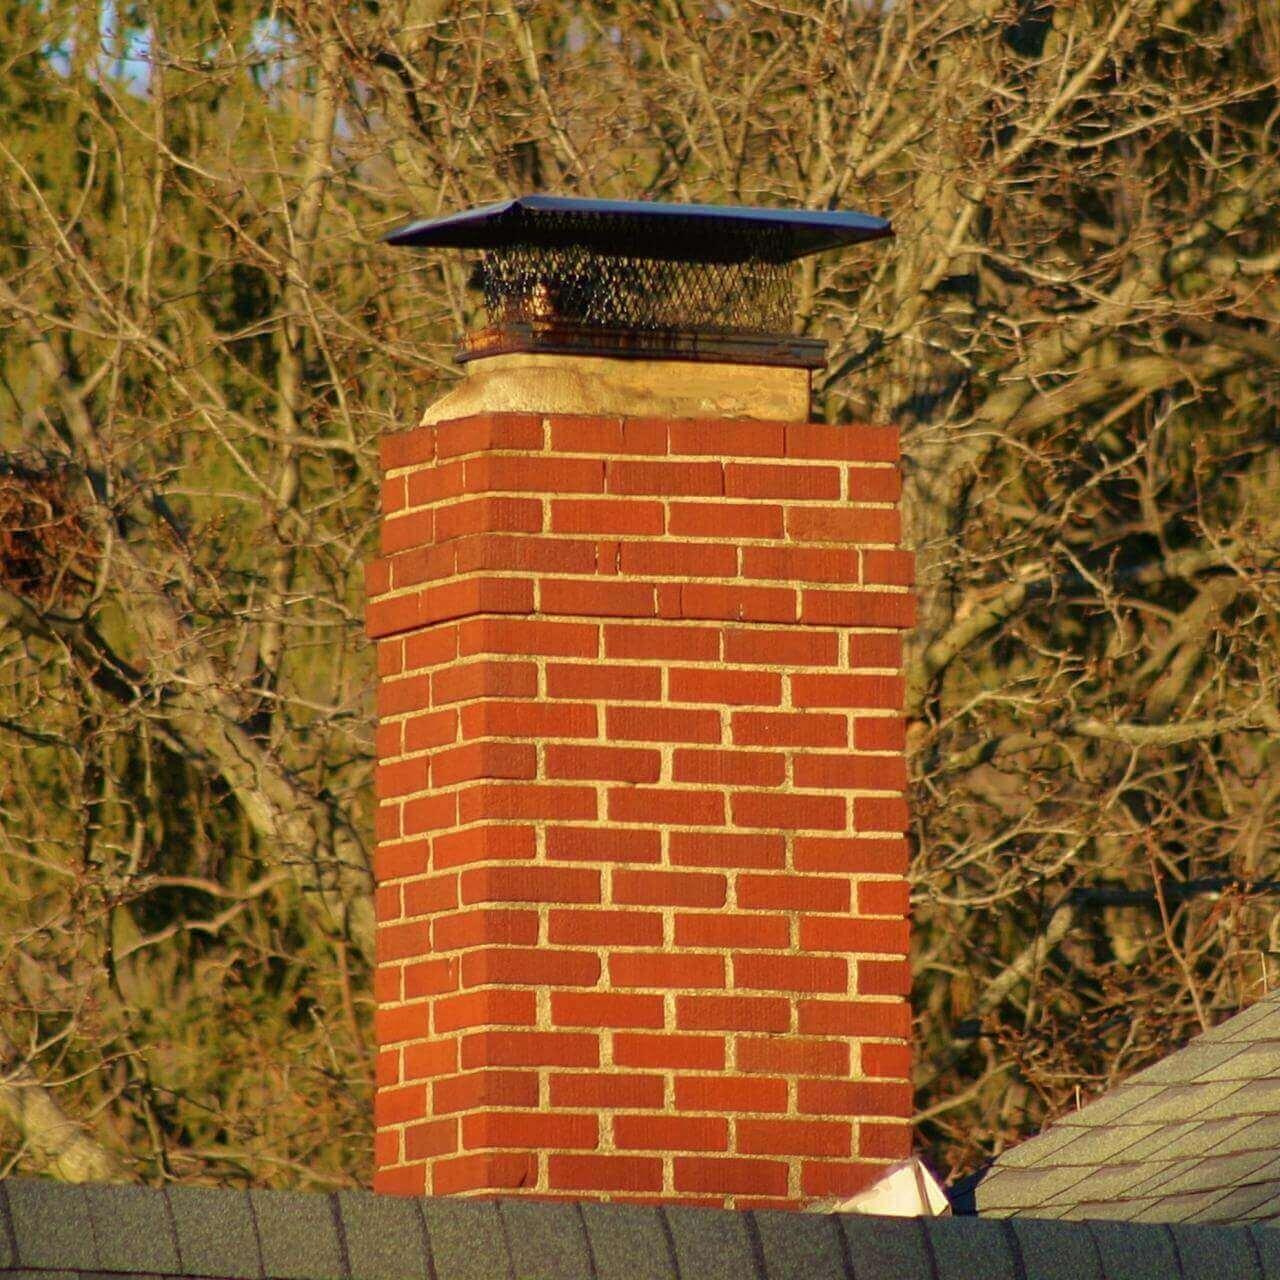 Masonry Chimney with no Flue